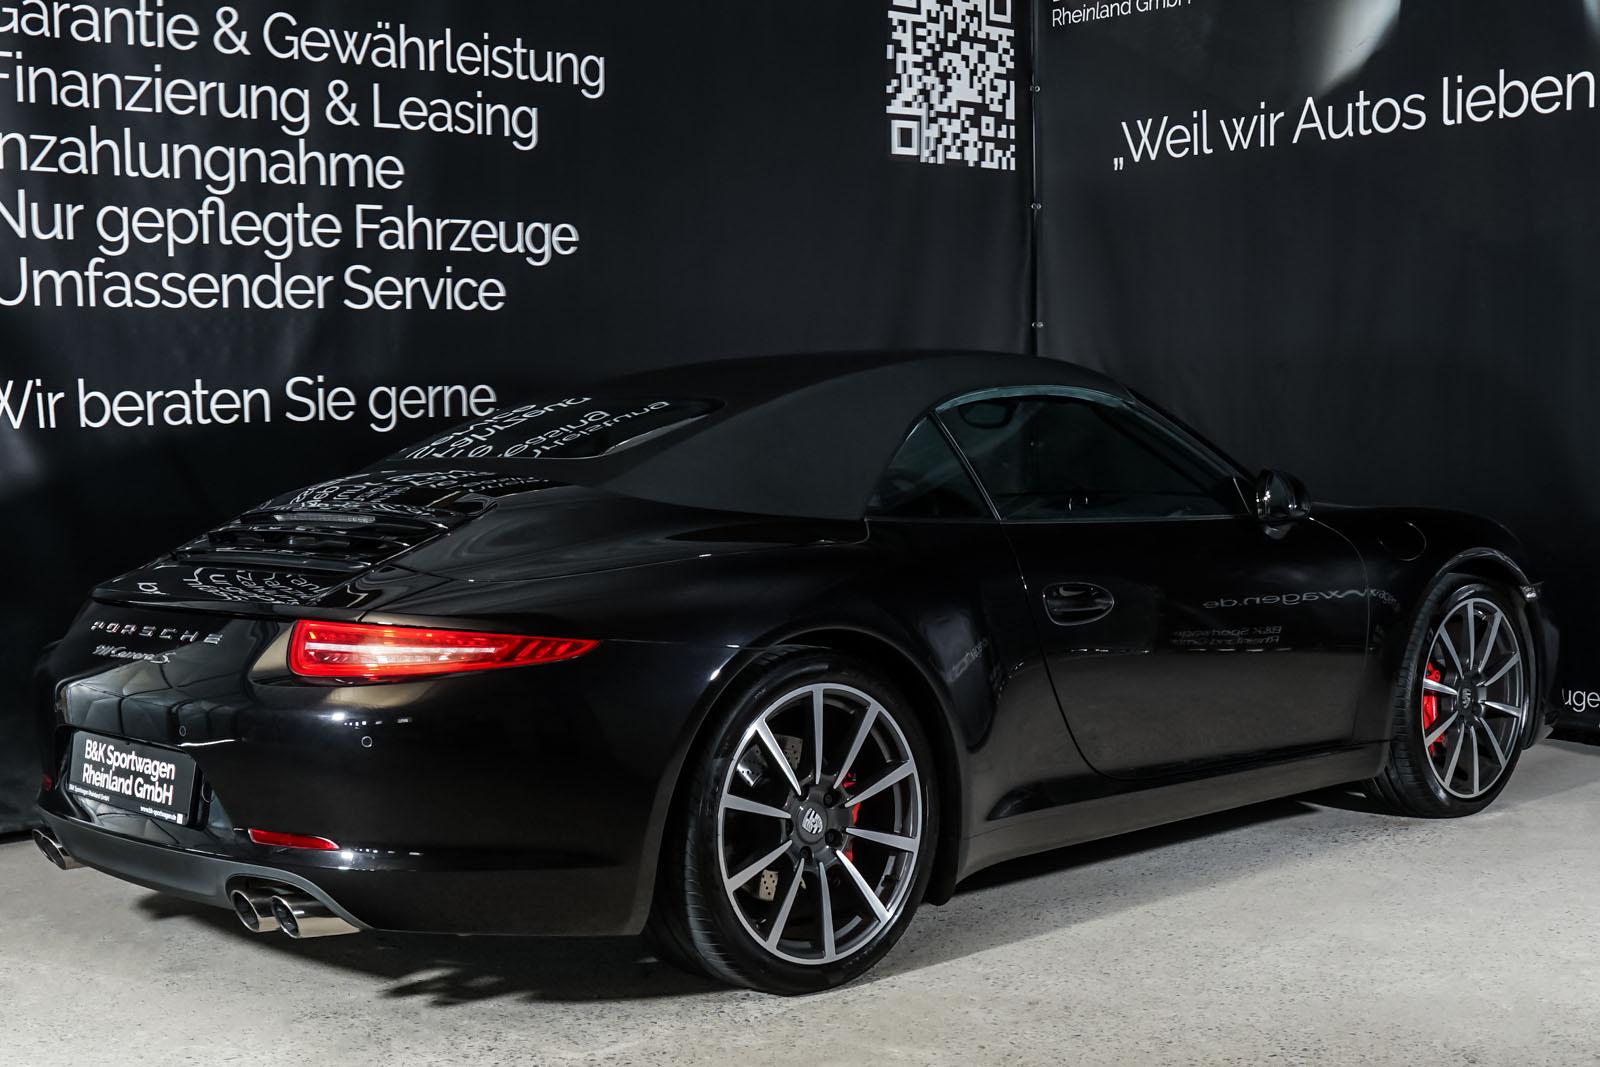 Porsche_991_CarreraS_Cabrio_Schwarz_Schwarz_POR-7555_21_w